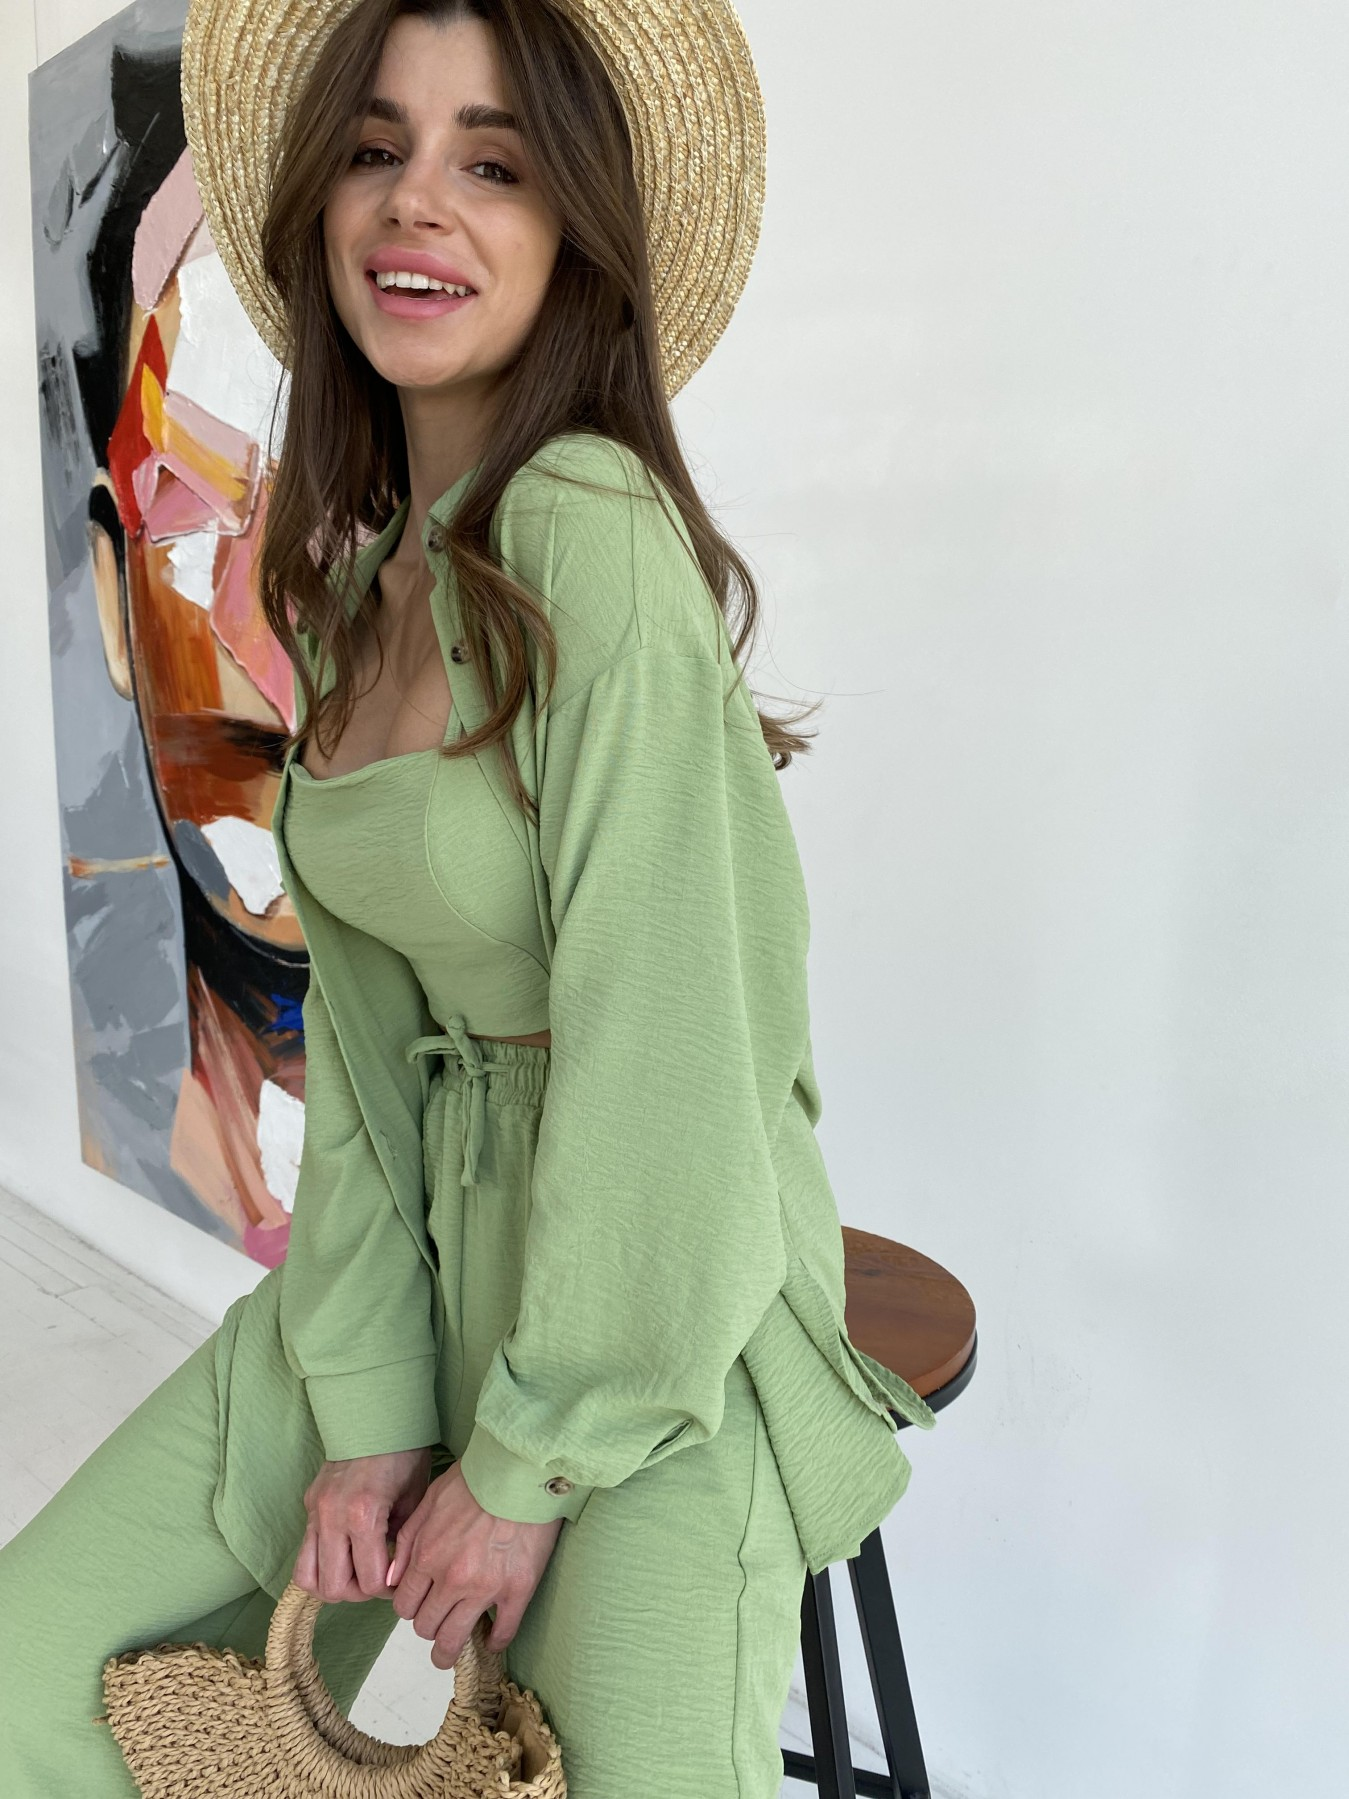 Квадро костюм американский из ткани креп (4 ед) 11303 АРТ. 48104 Цвет: олива яркая - фото 4, интернет магазин tm-modus.ru